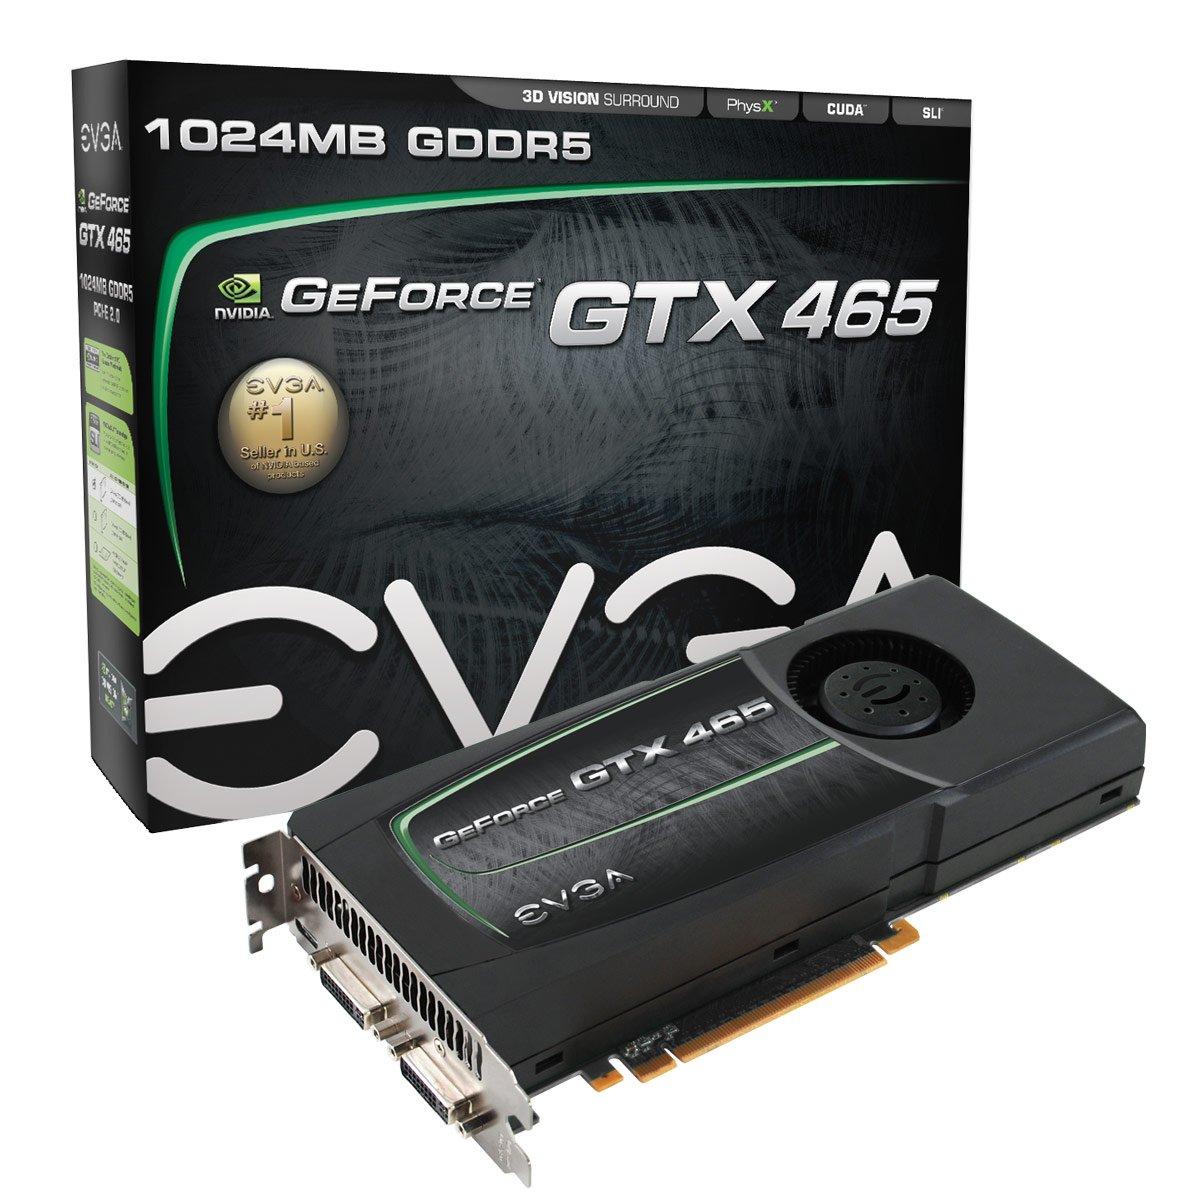 Amazon.com: EVGA GeForce GTX 465 1024 MB GDDR5 PCI Express 2.0  2DVI/Mini-HDMI SLI Ready Limited Graphics Card, 01G-P3-1465-AR: Electronics